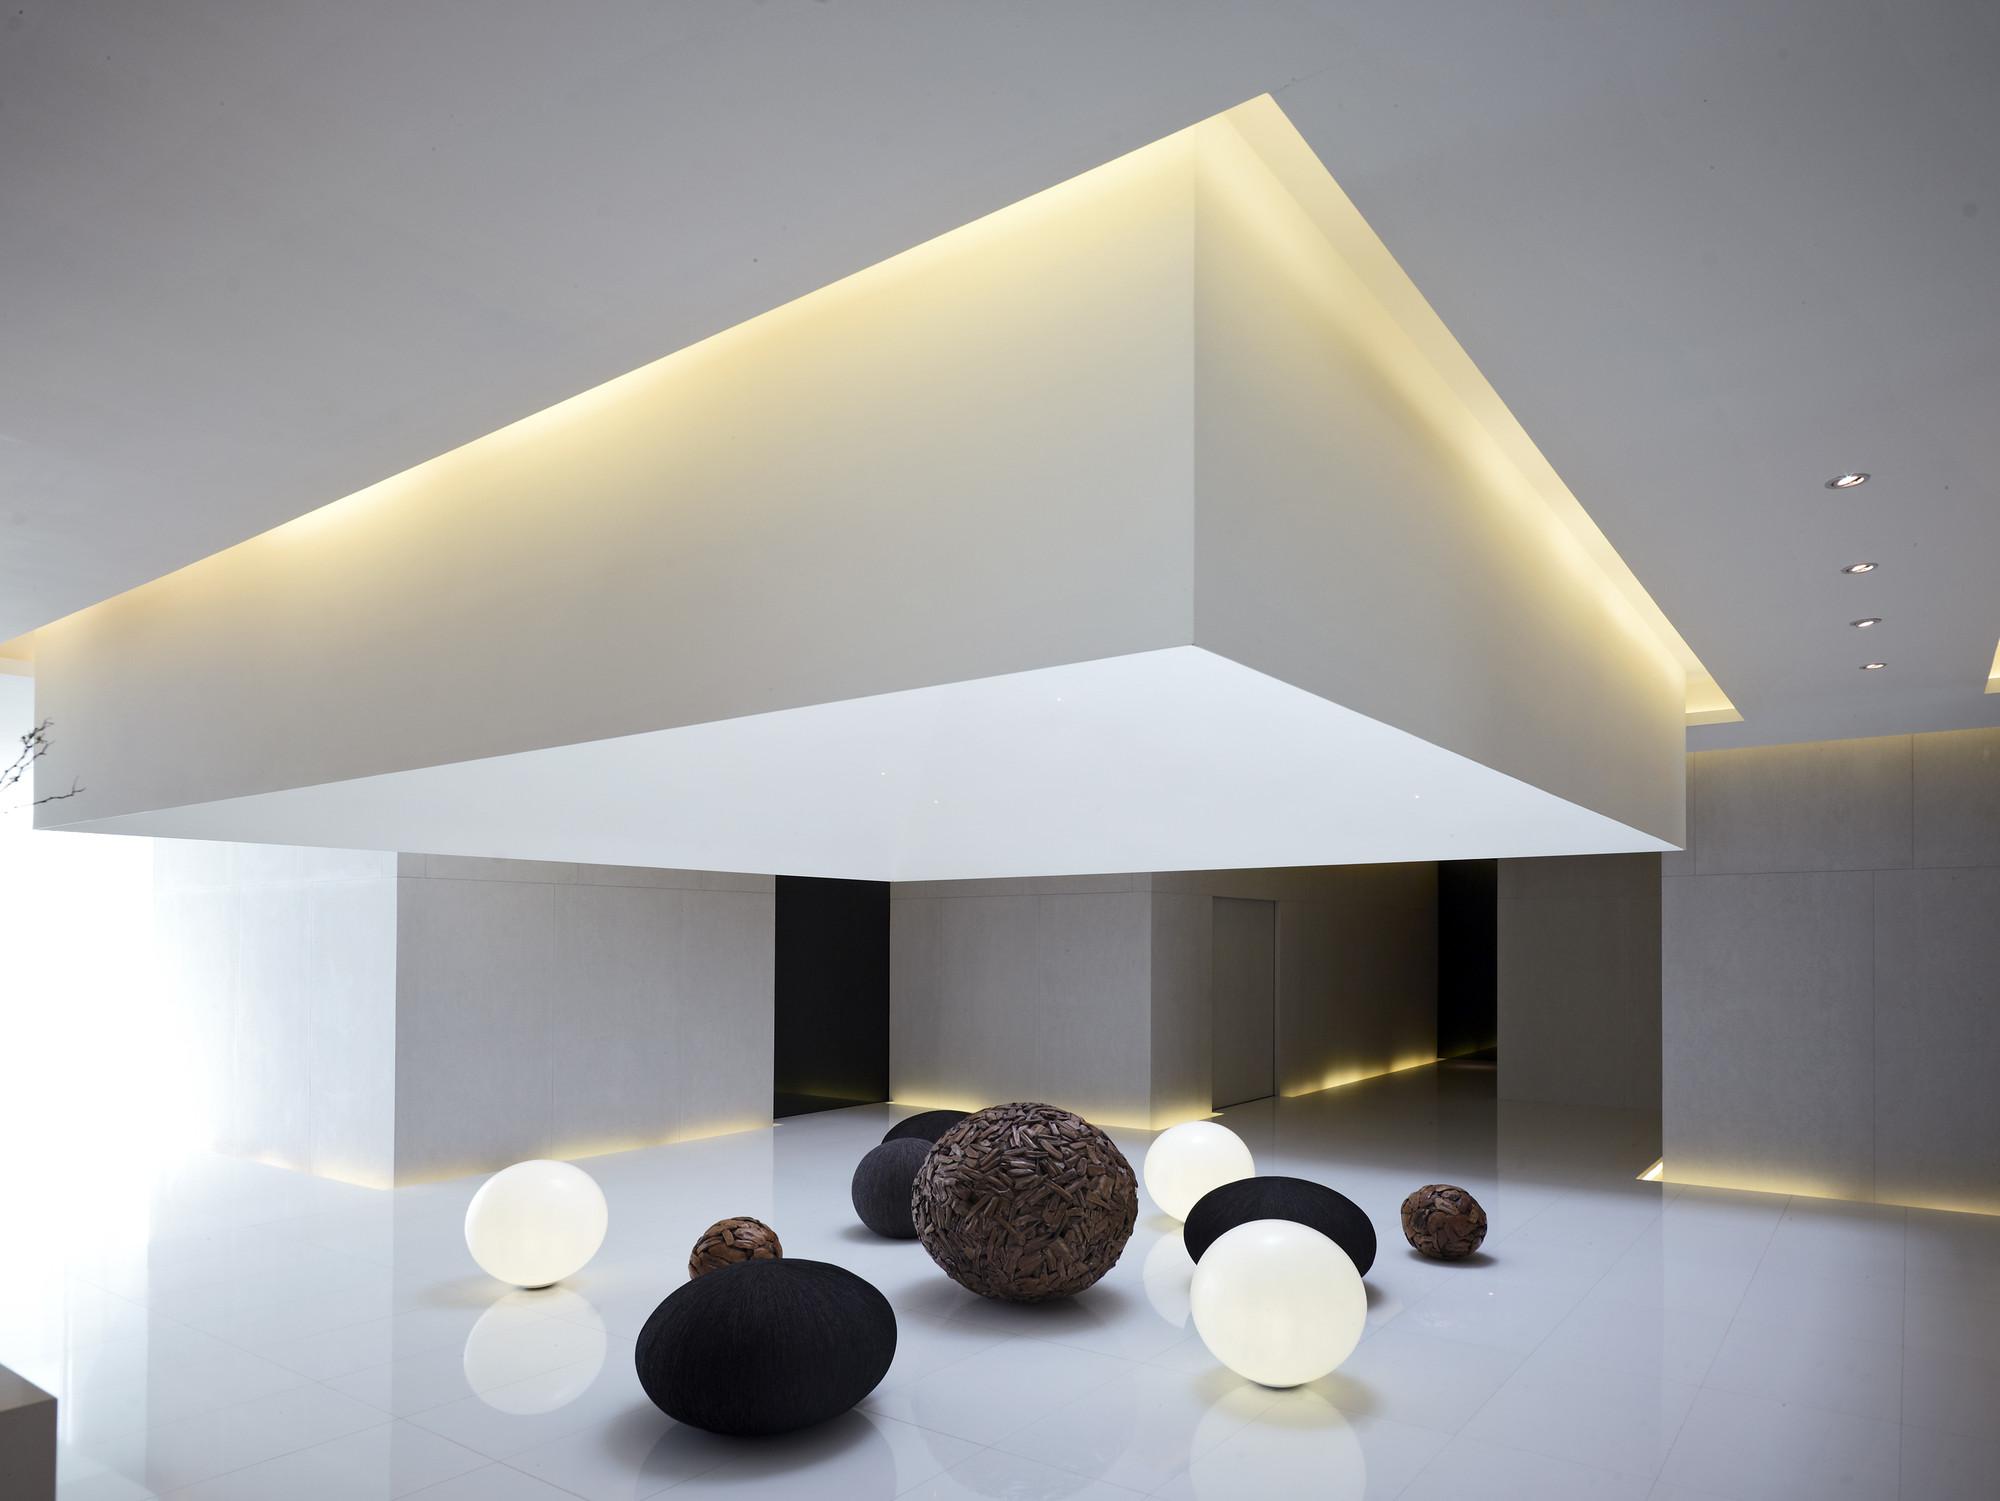 Gallery of lightbox hsuyuan kuo architect associates 3 for Architect associates